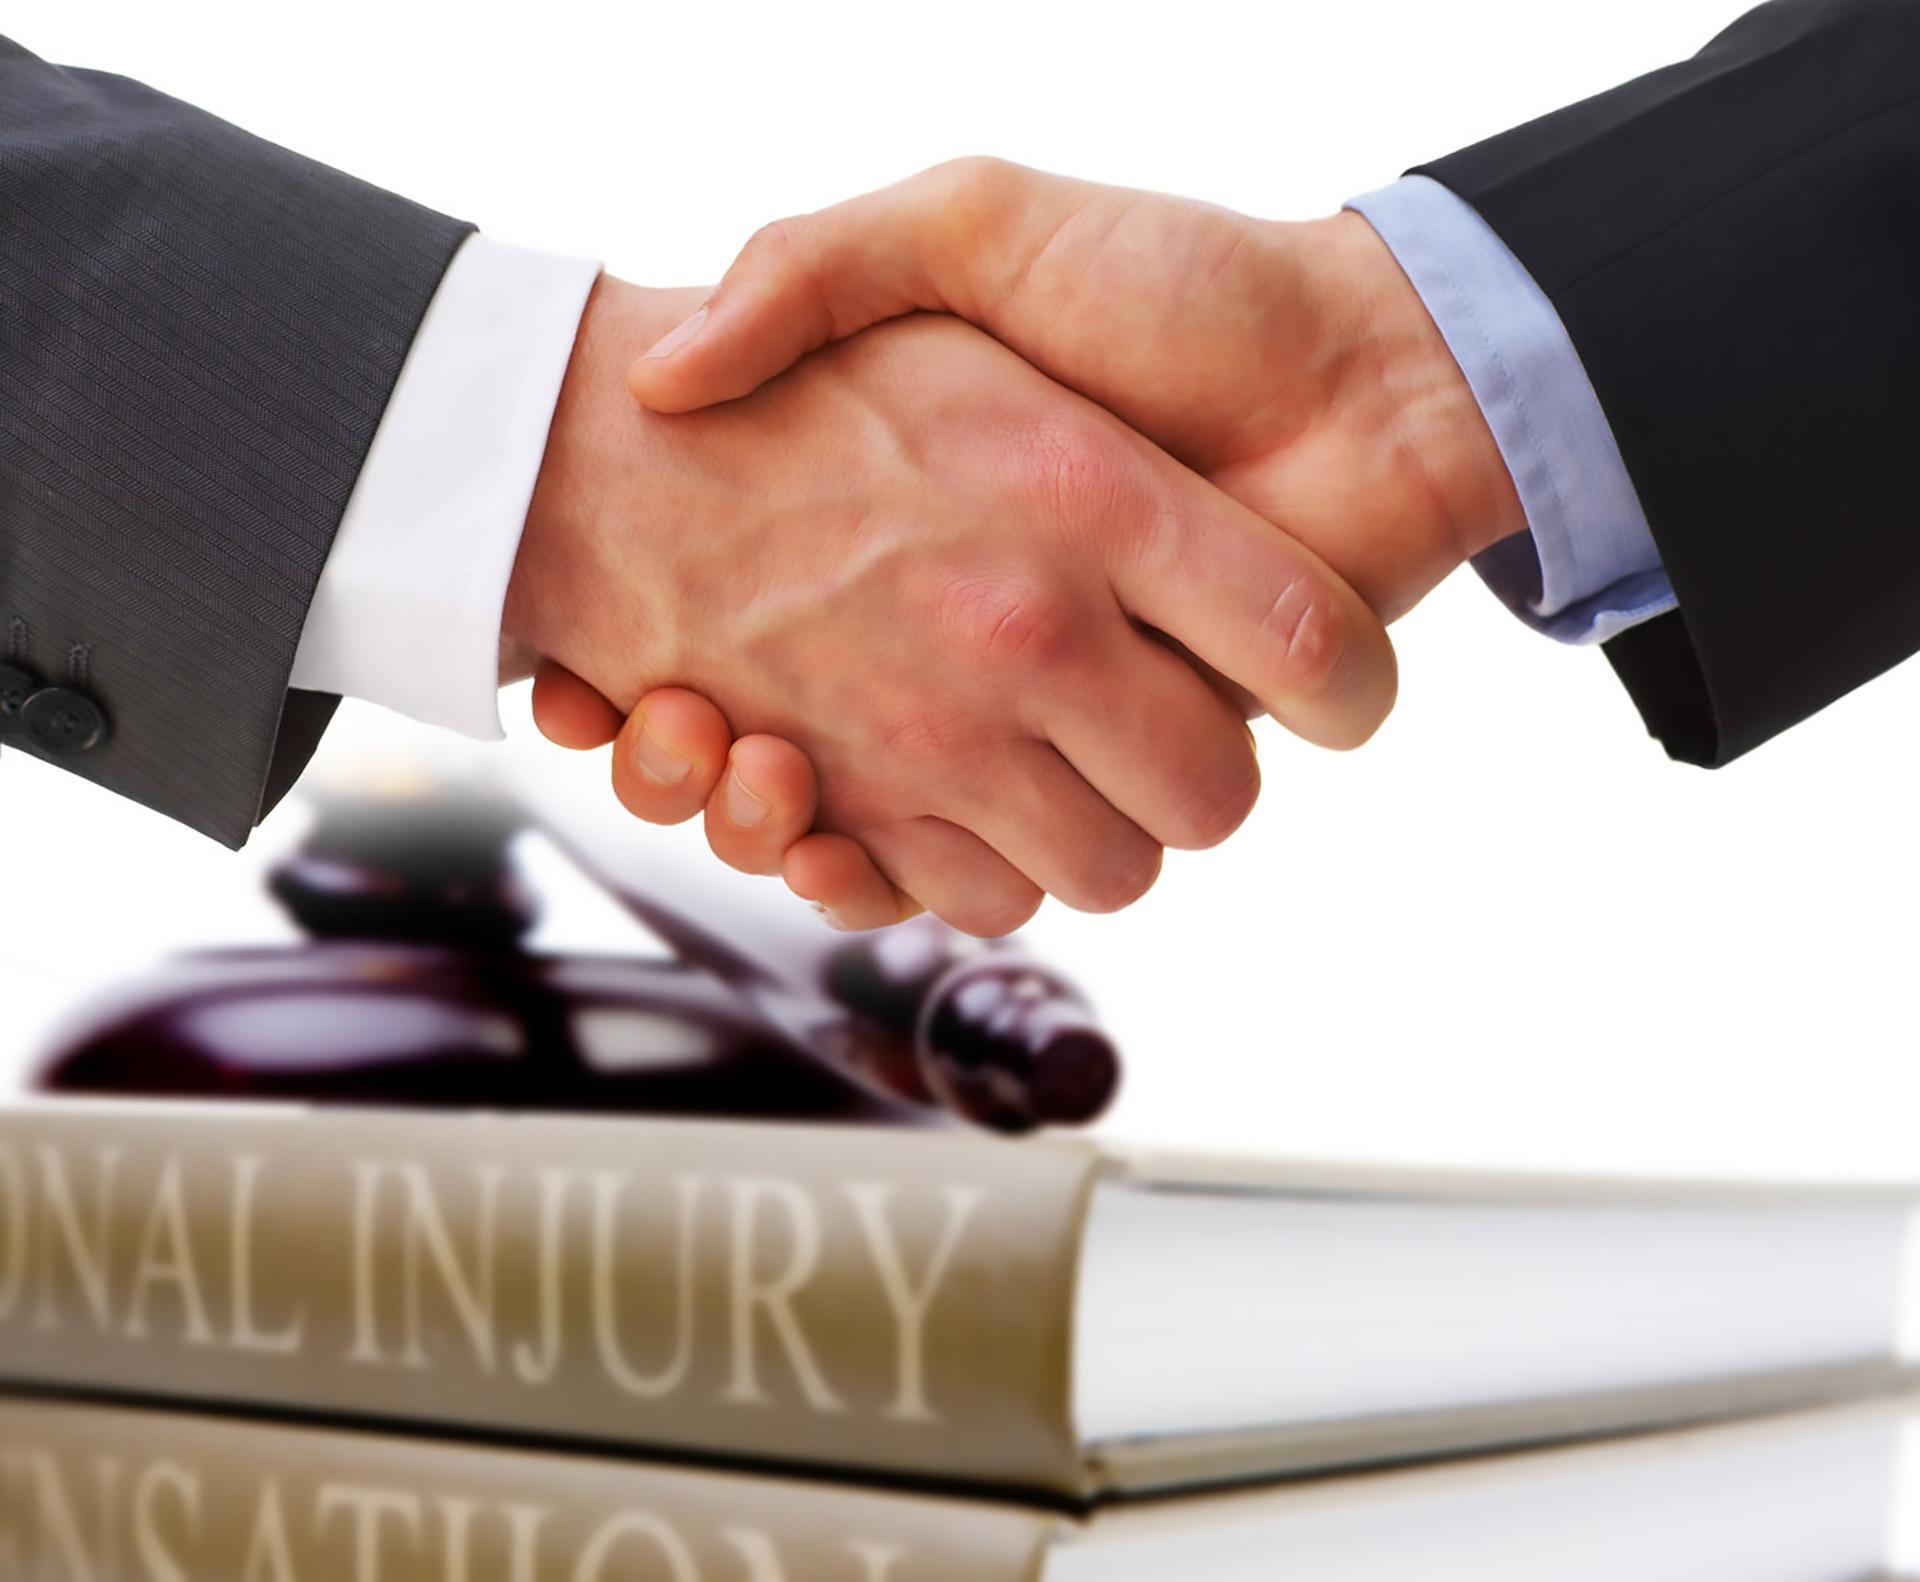 personal injury lawyer